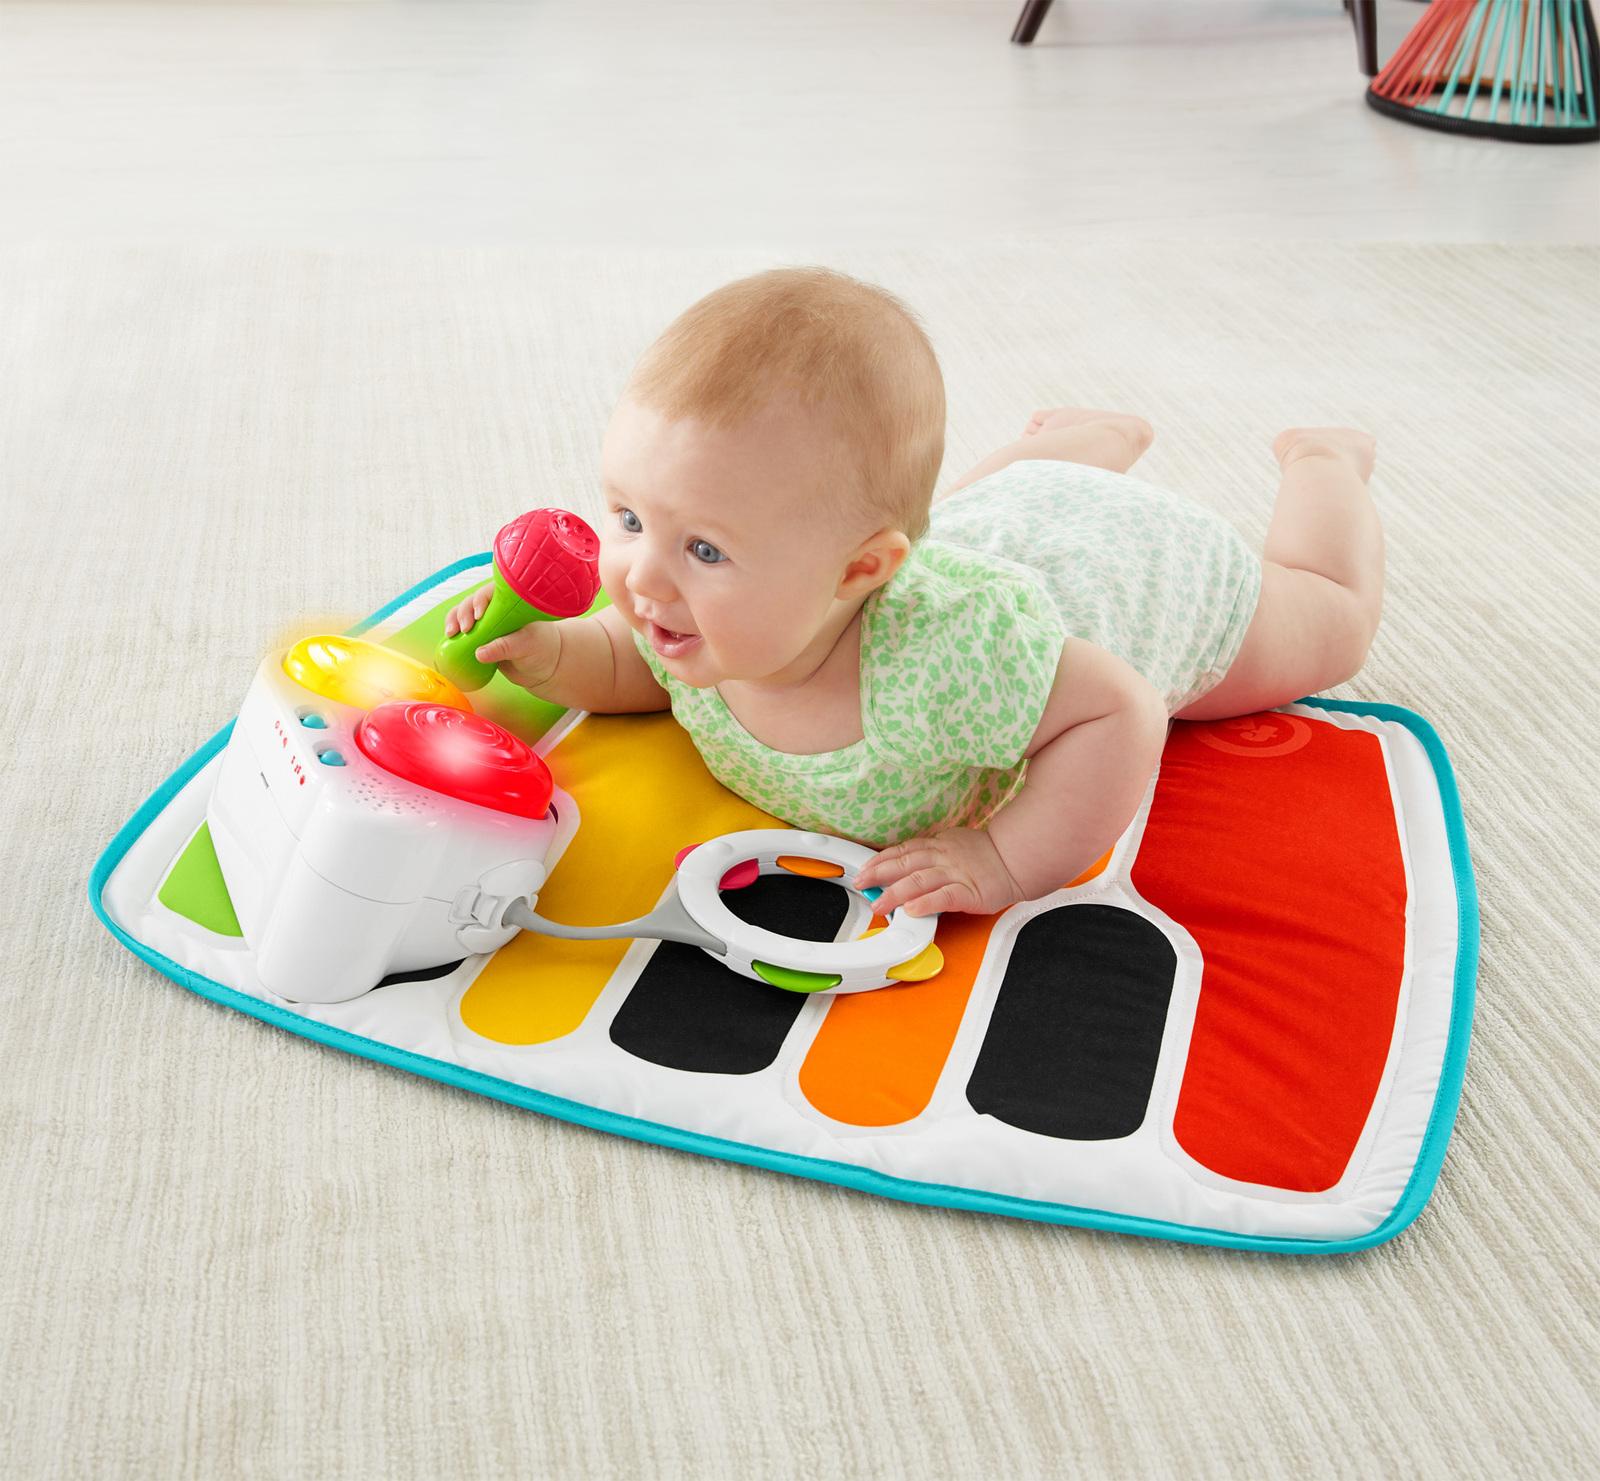 Developmental Baby Toys : Baby activity walker center developmental toddler toys